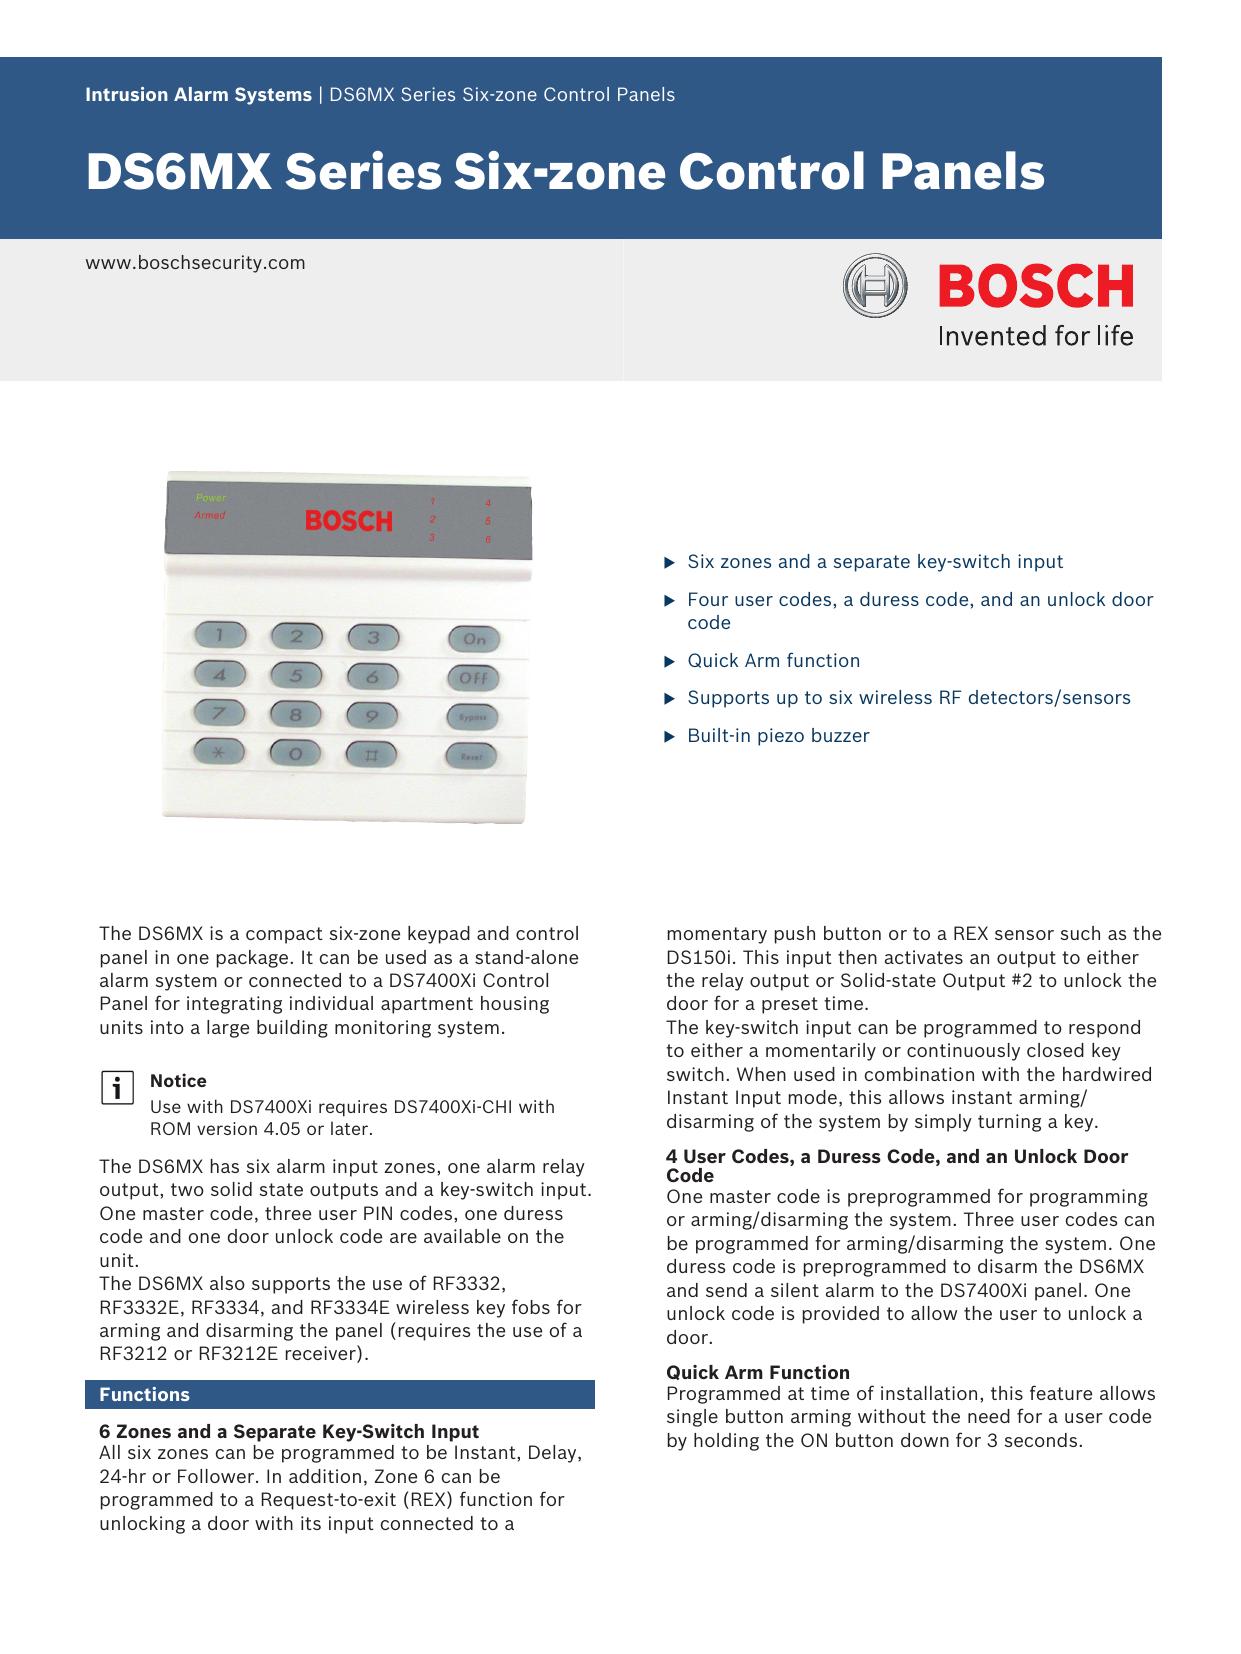 DS6MX Series Six-zone Control Panels | manualzz com